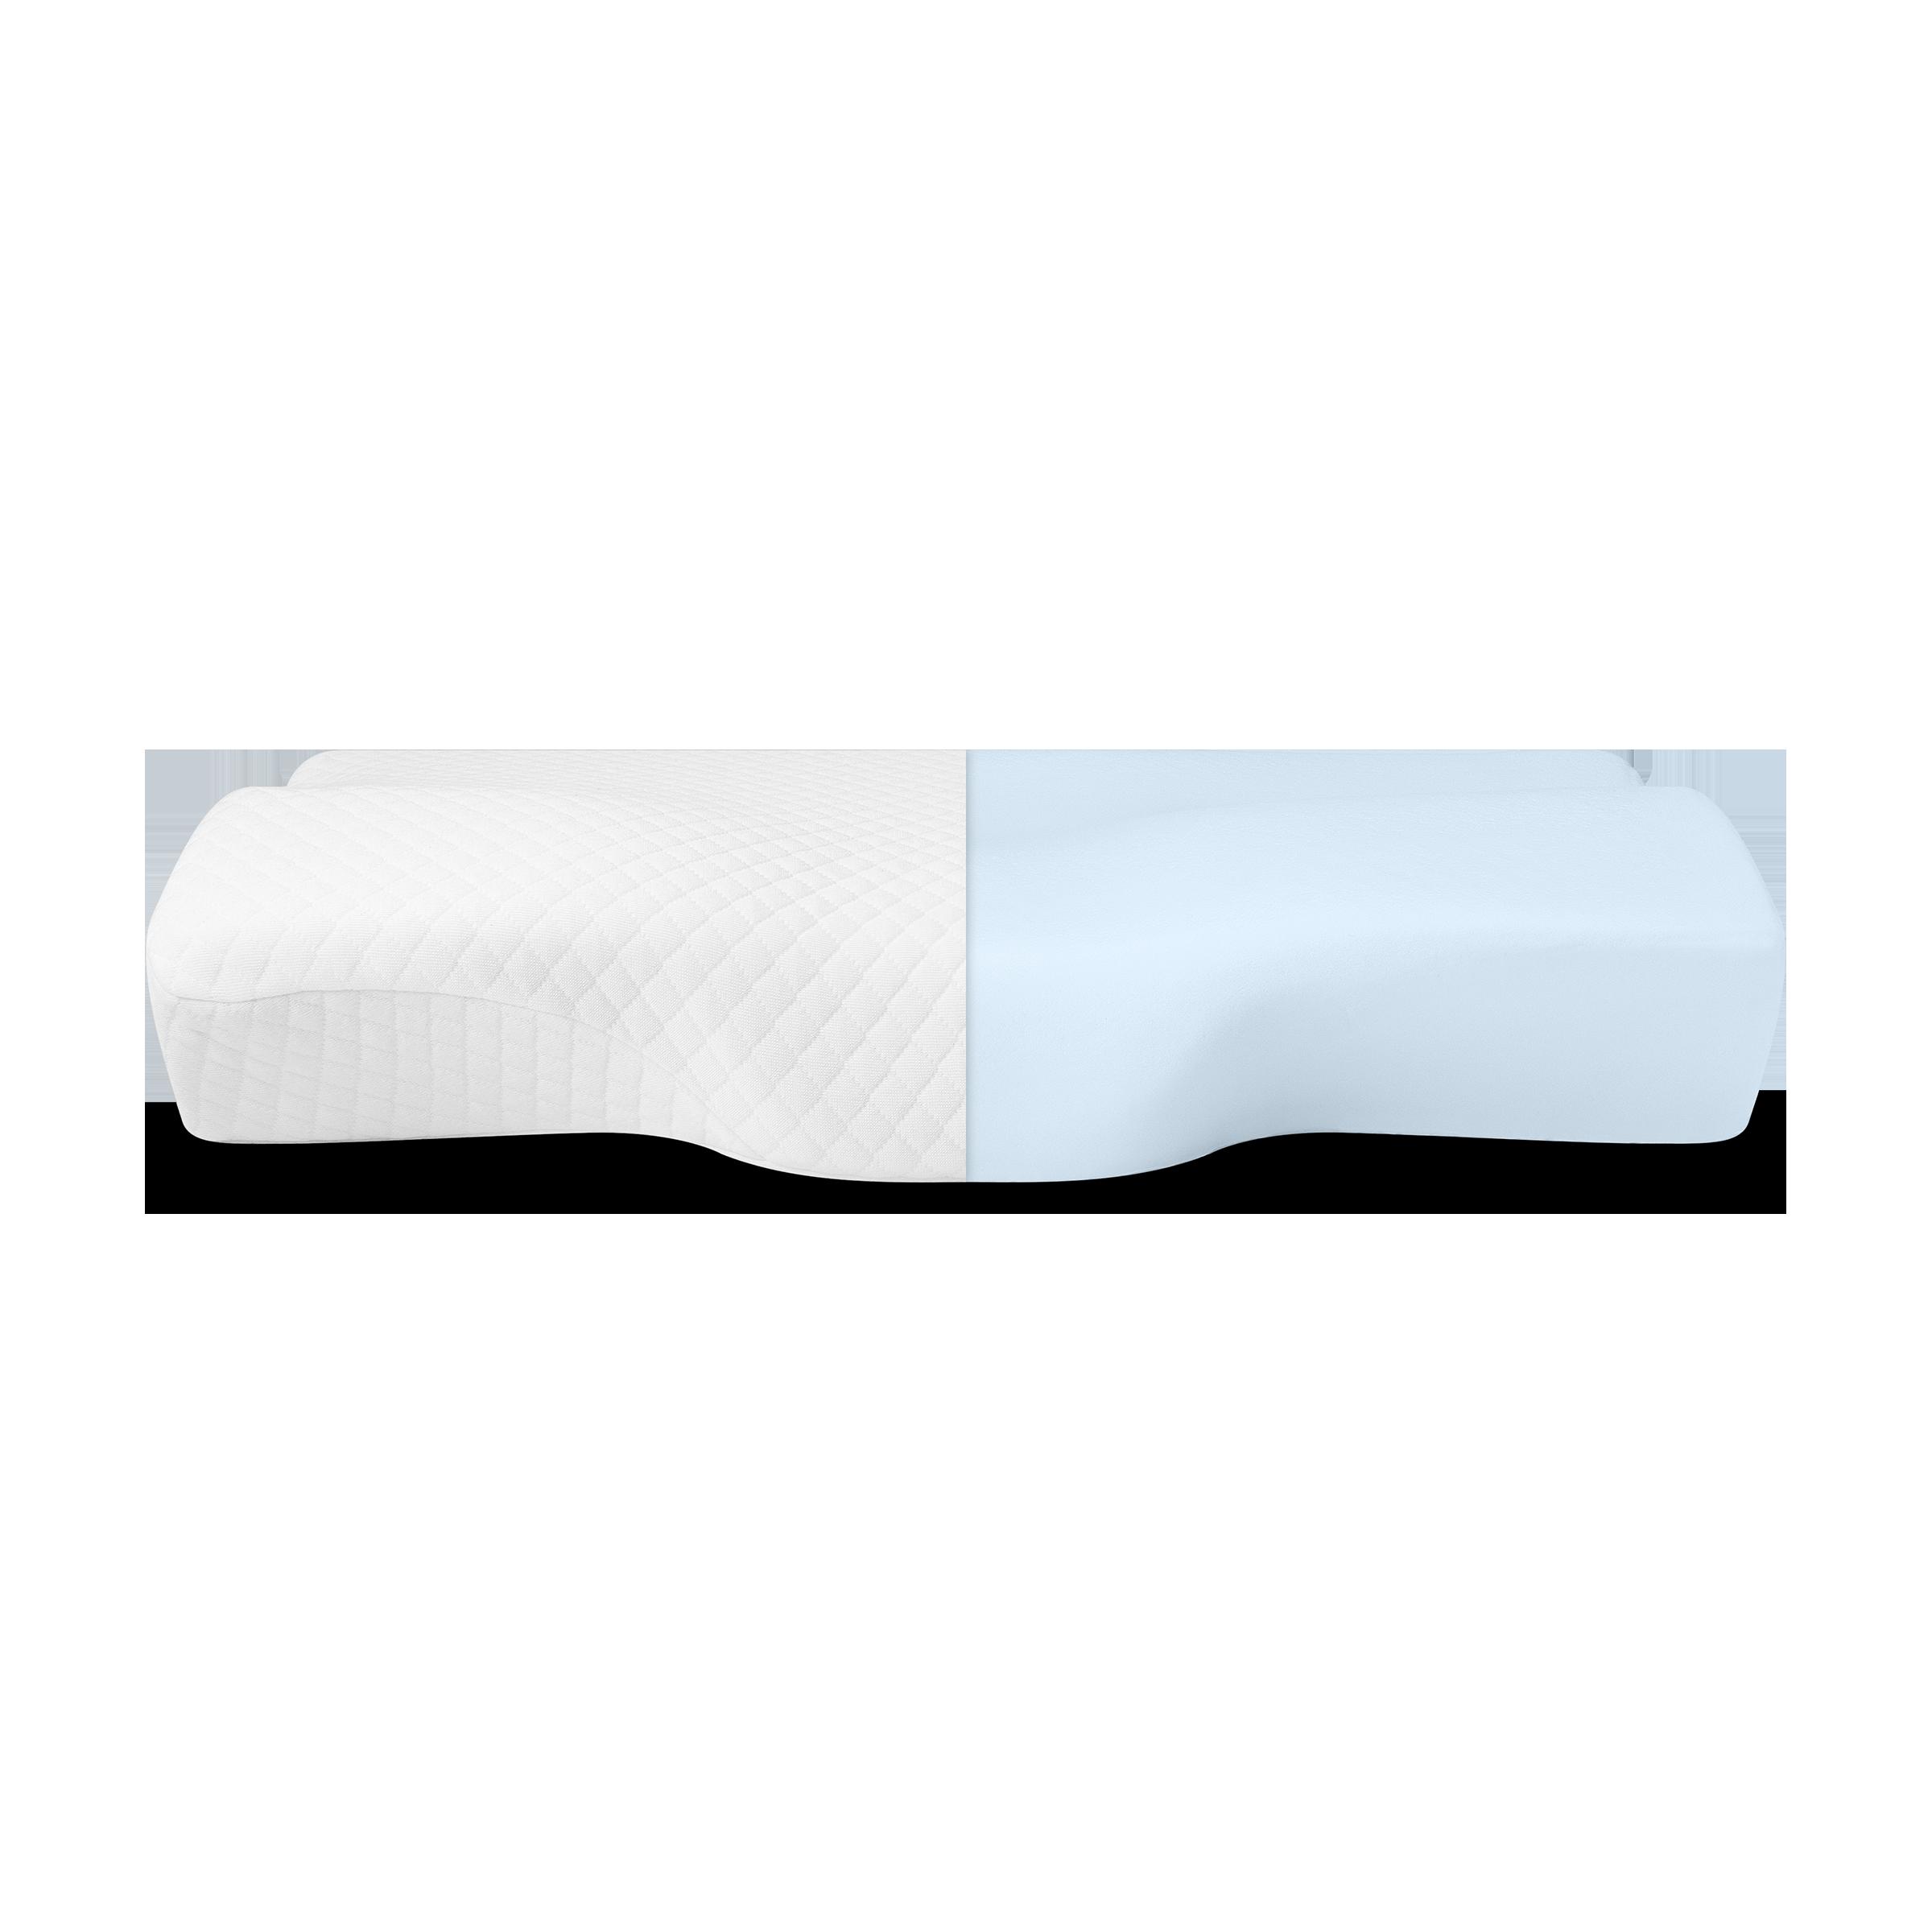 pillowcase product image